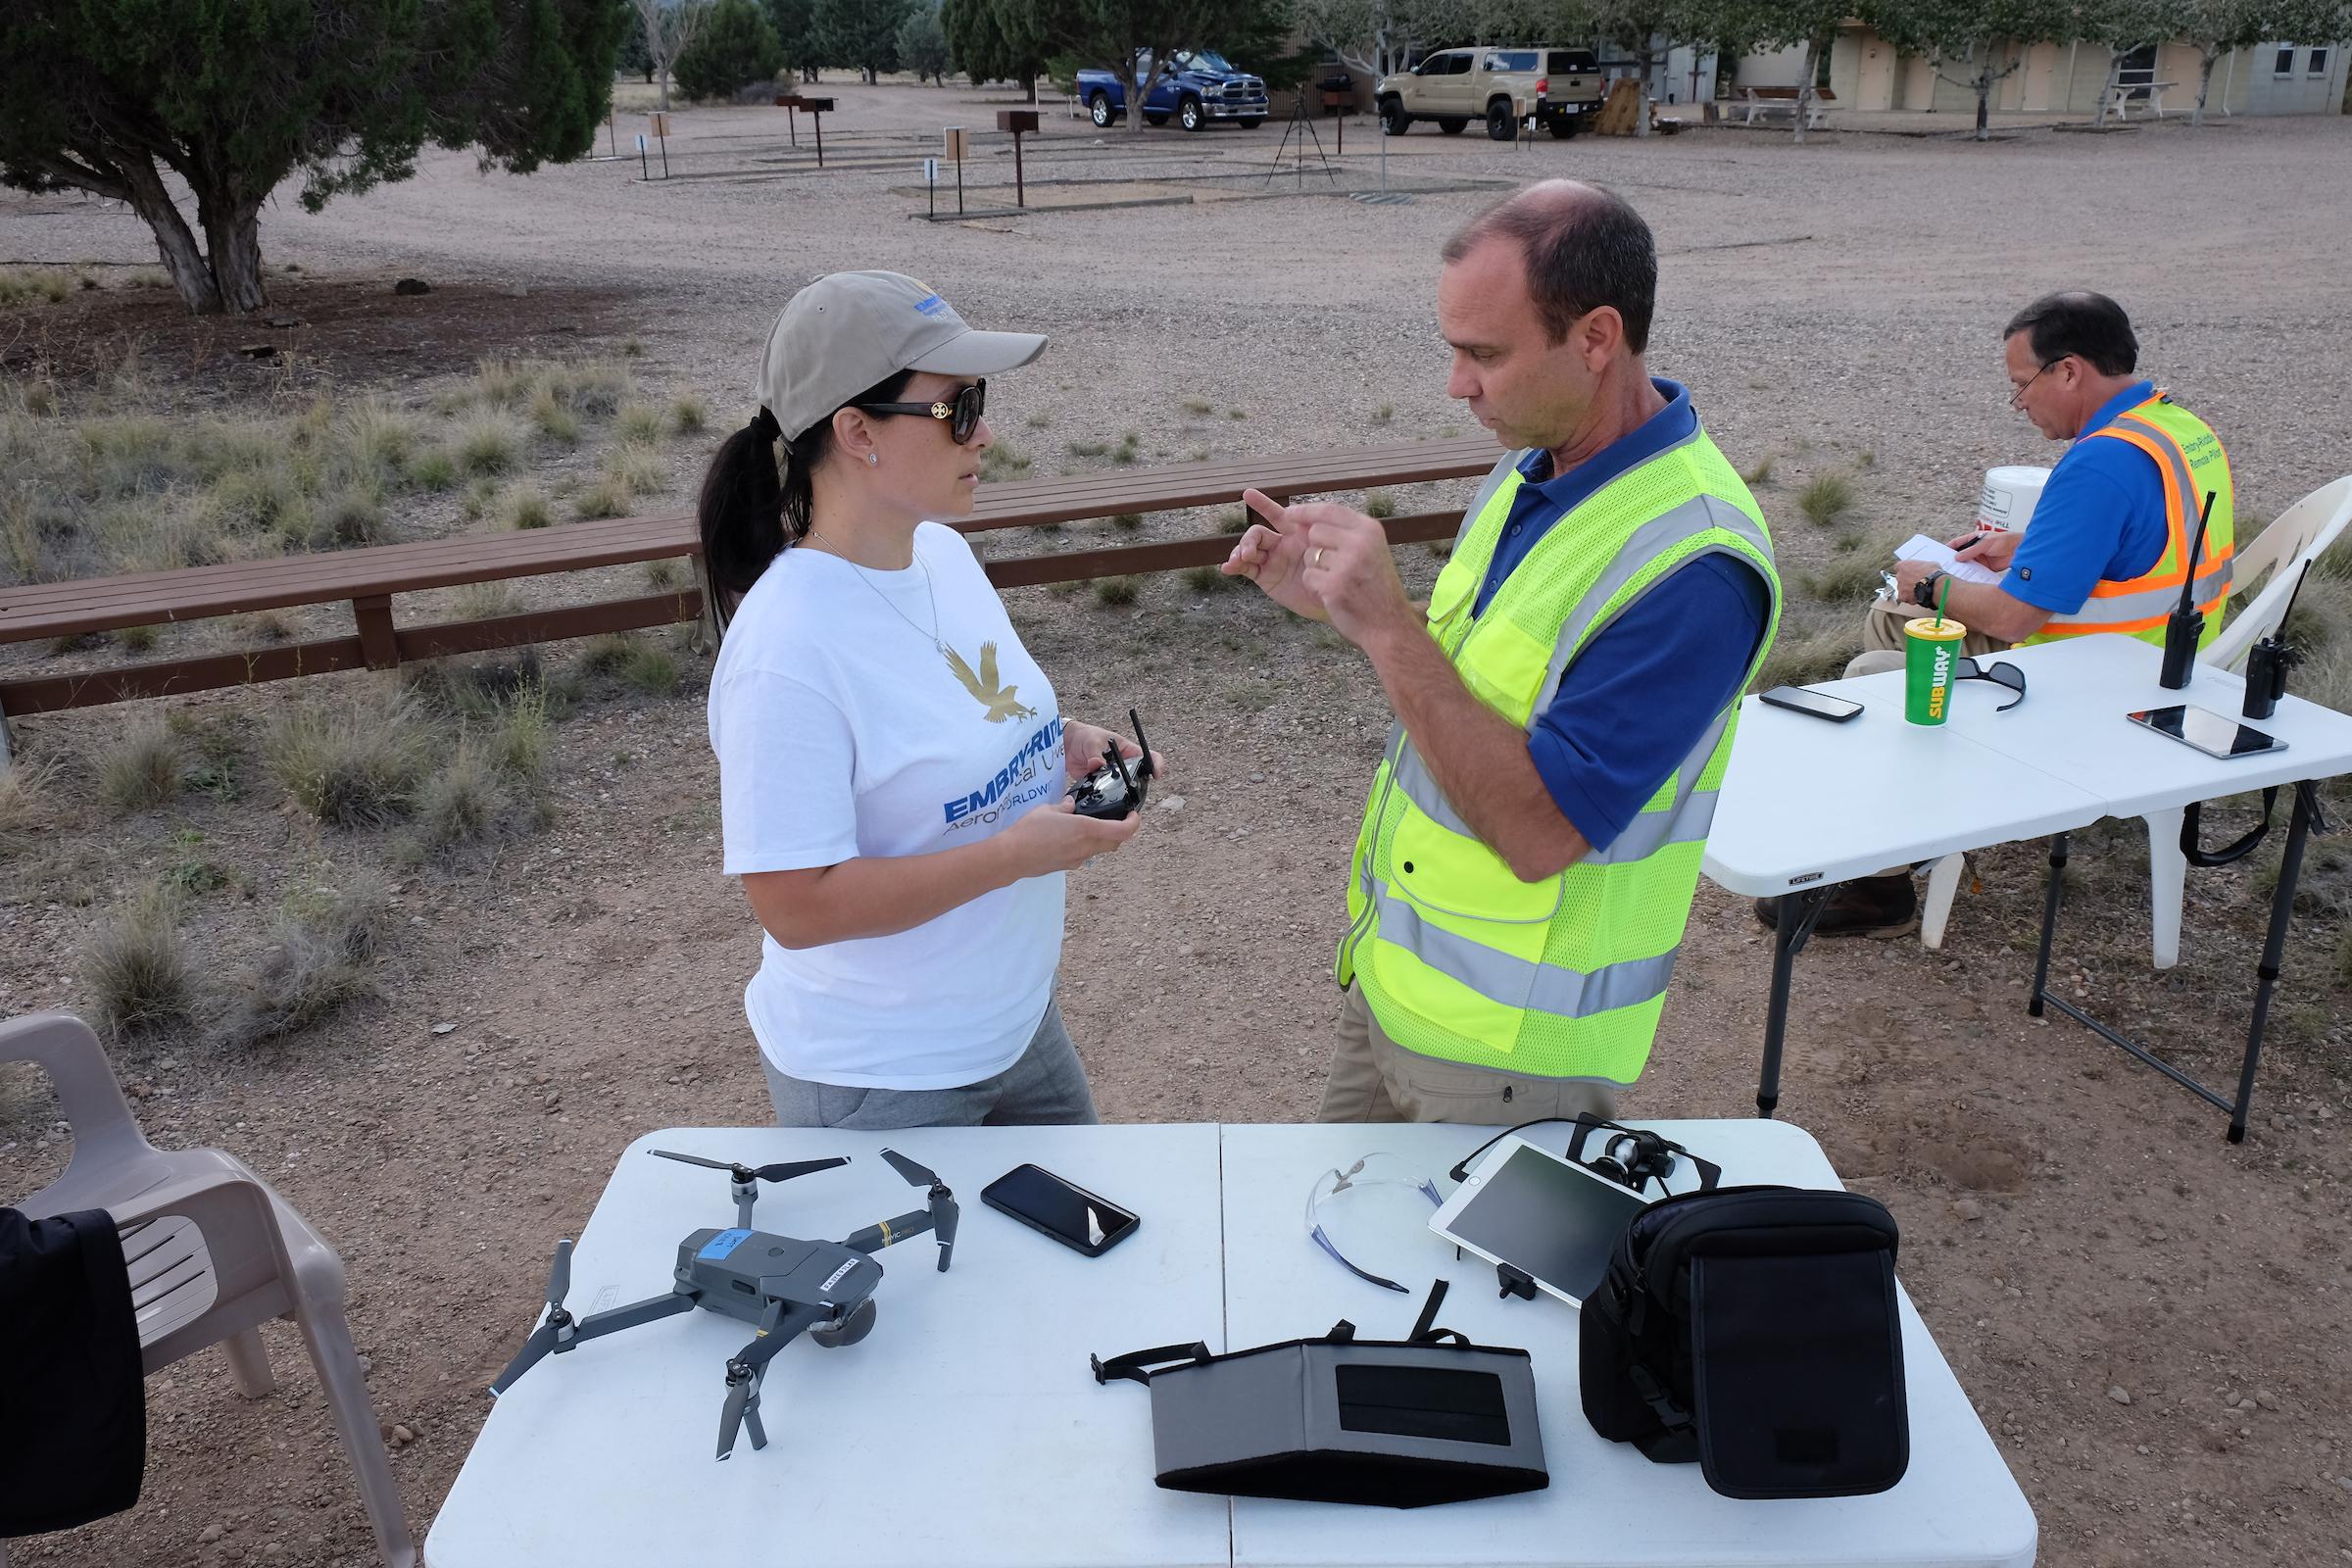 sUAS instructors and operator preparing for flight